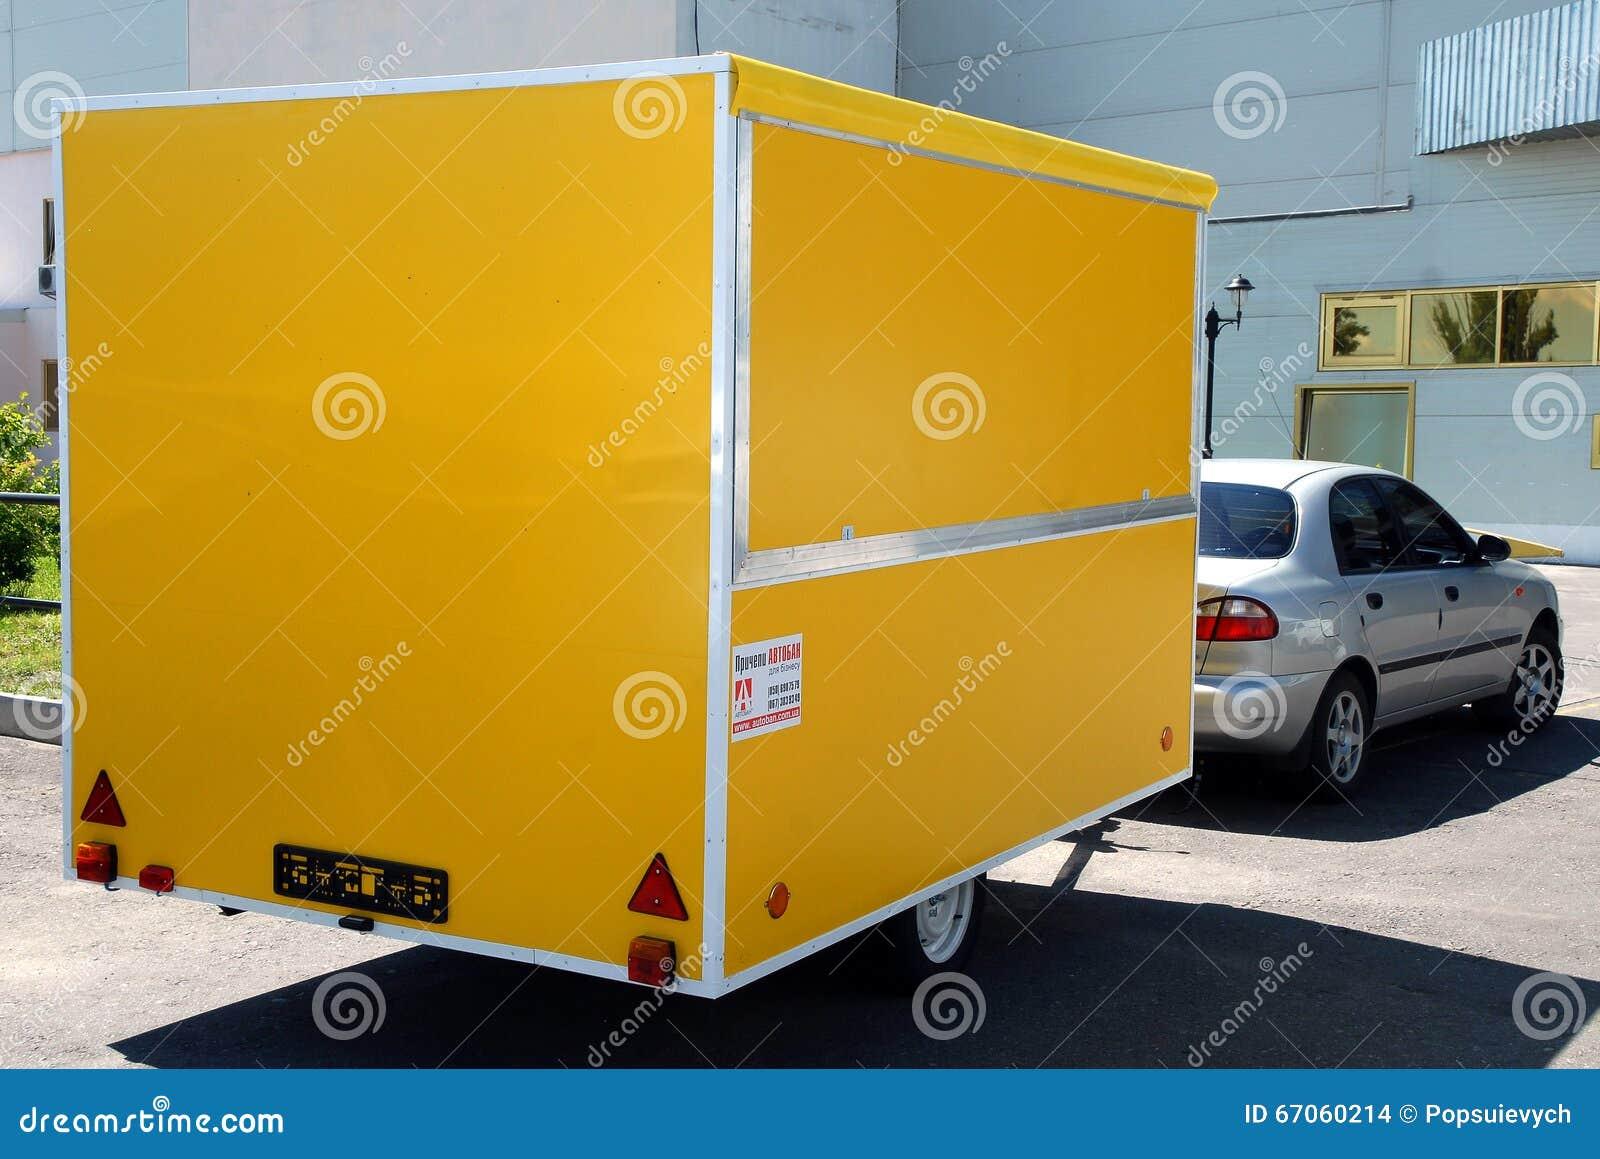 Remorque boutique bande transporteuse caoutchouc for Distripool magasin